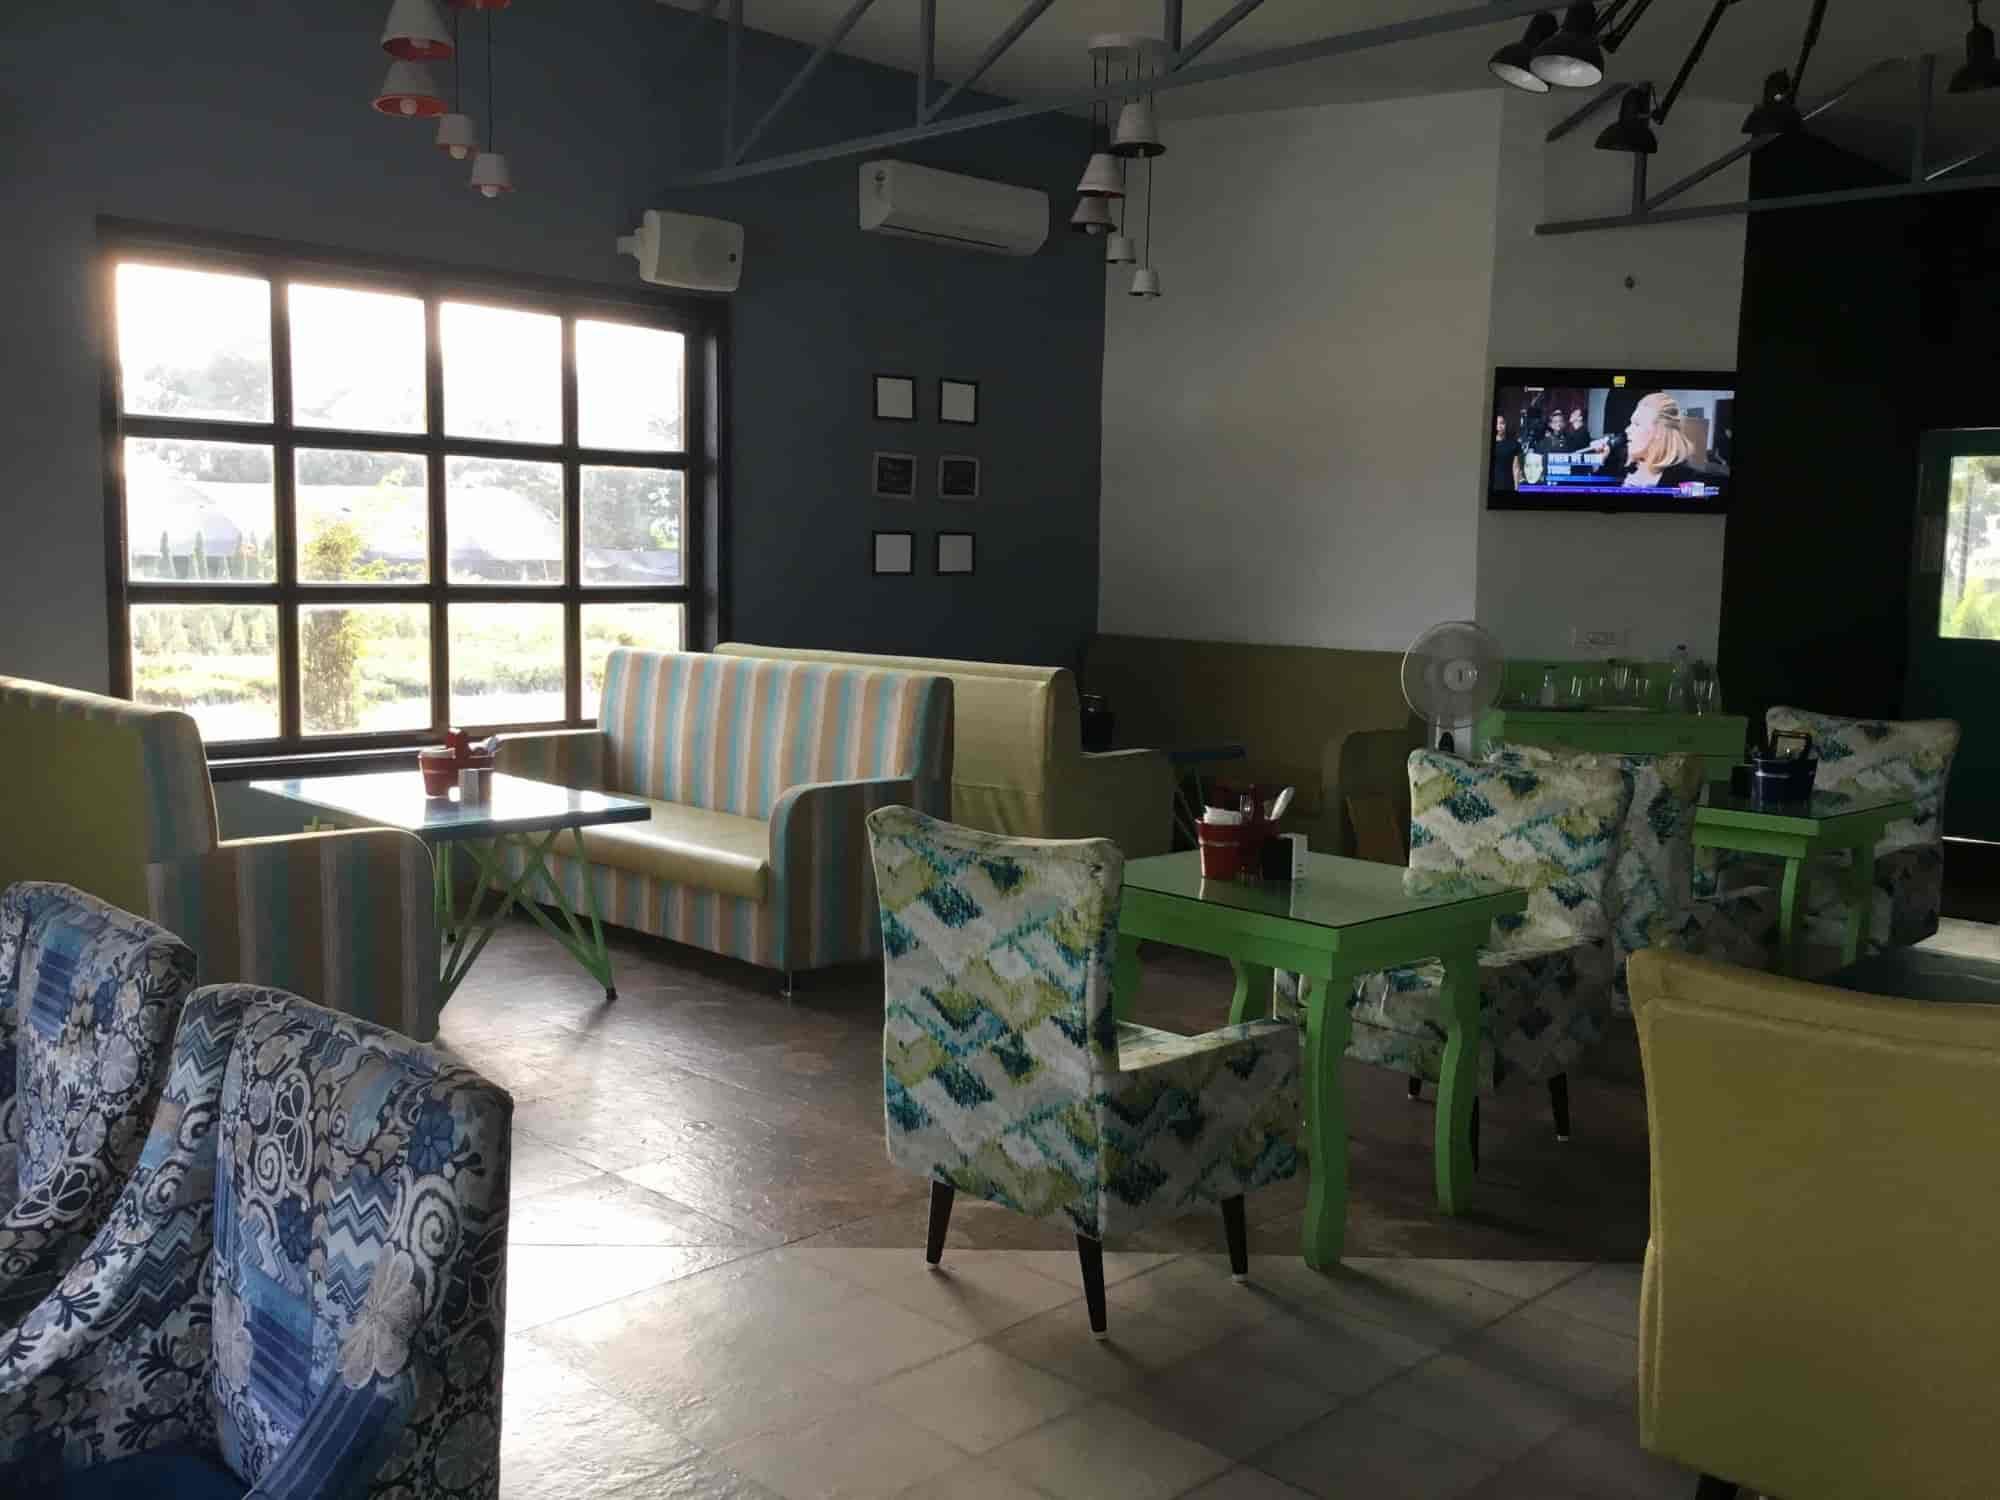 The Living Room Cafe Reviews, Vishal Nagar, Raipur Chhattisgarh   317  Ratings   Justdial